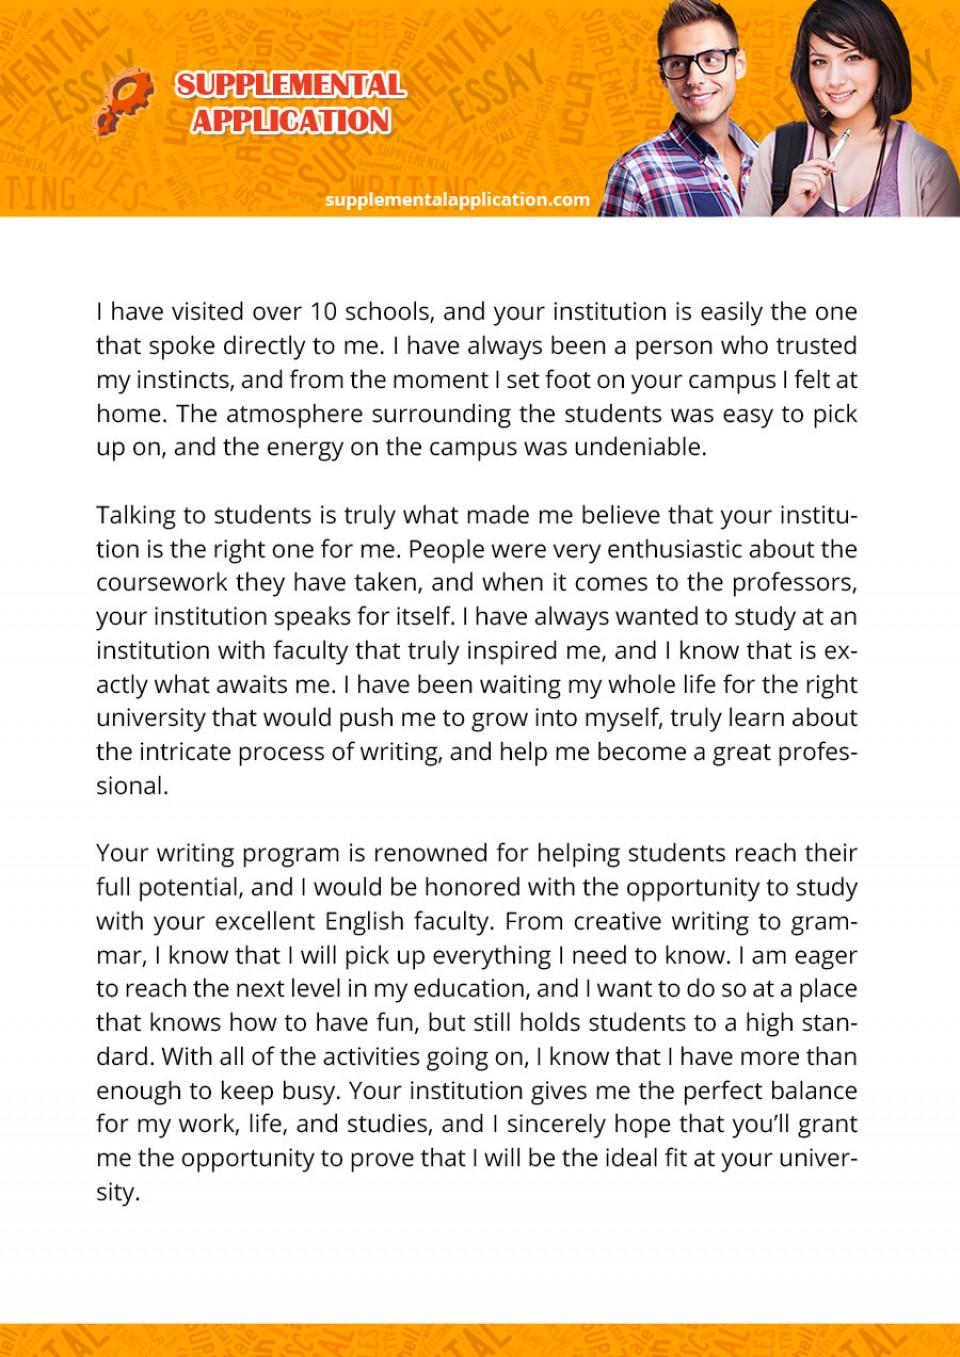 How to Write the Rice University Essays